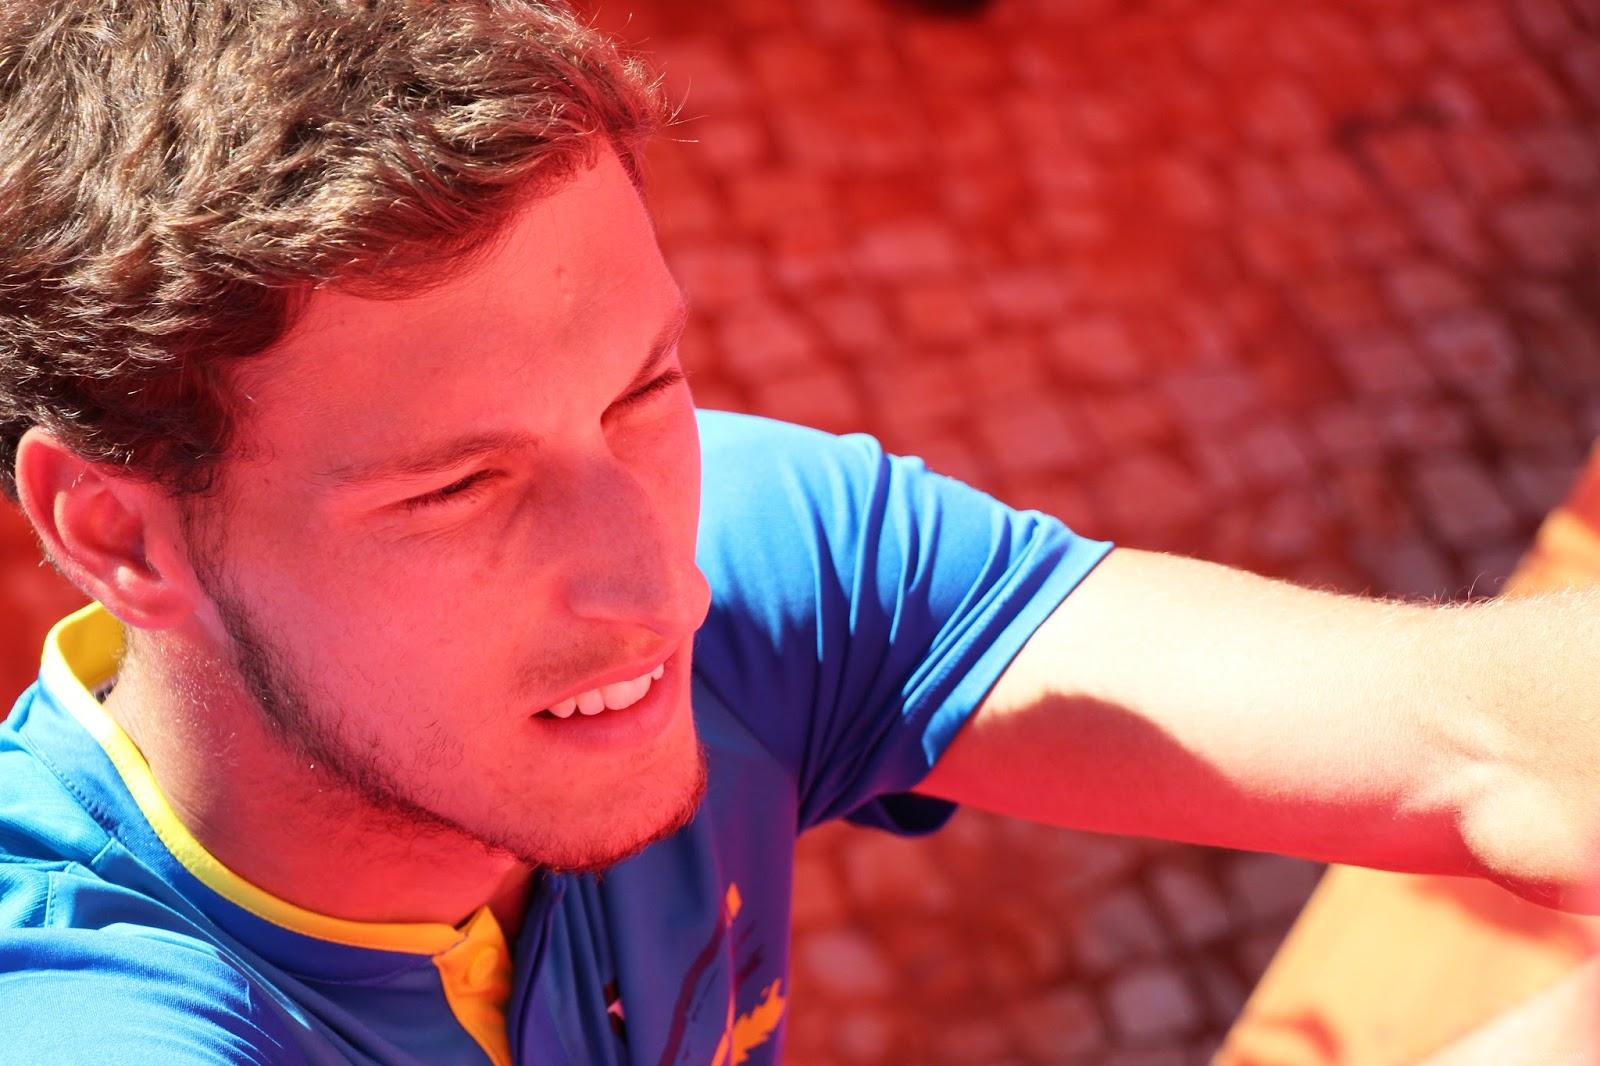 Pablo Carreño-Busta - Millennium Estoril Open 2017